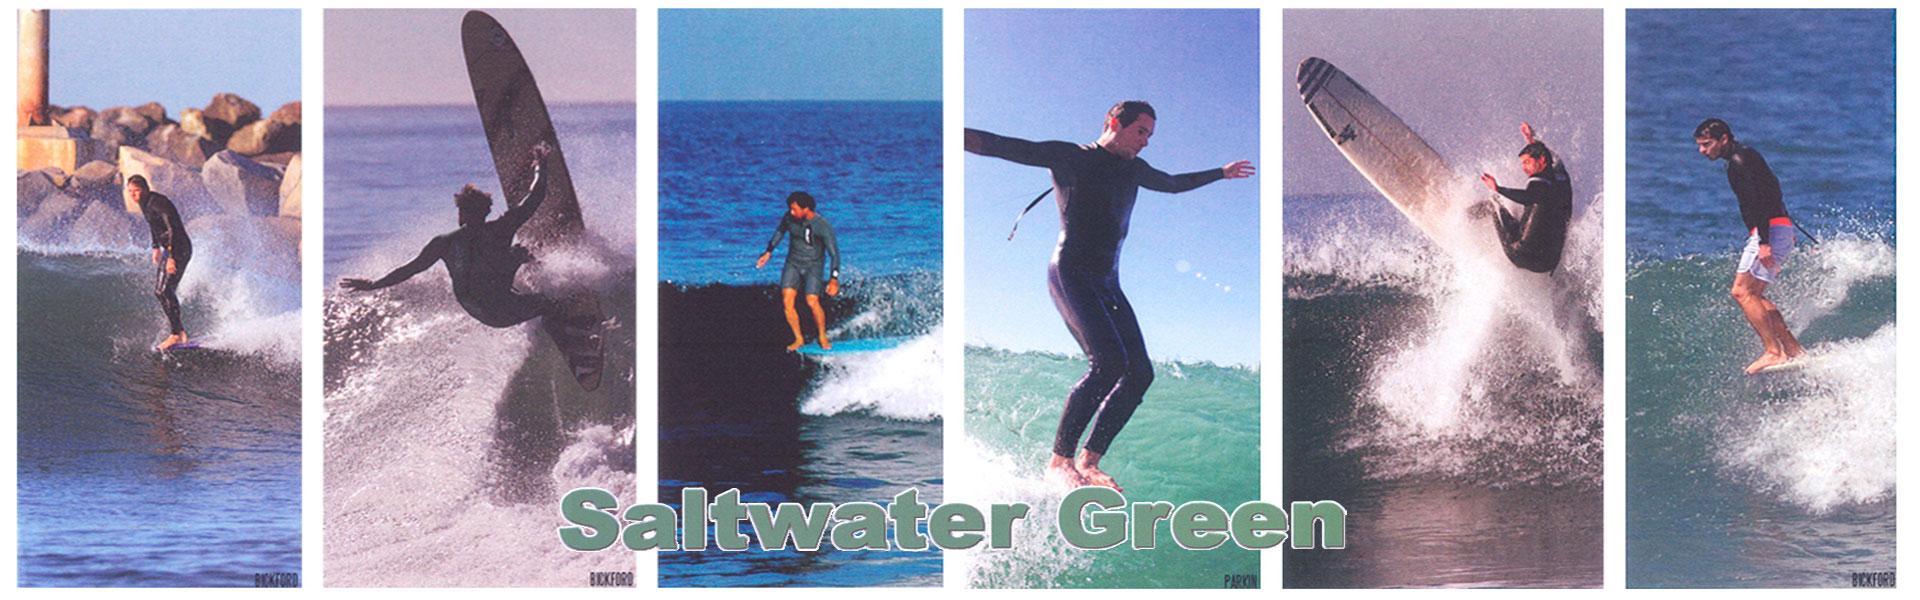 Saltwater Green